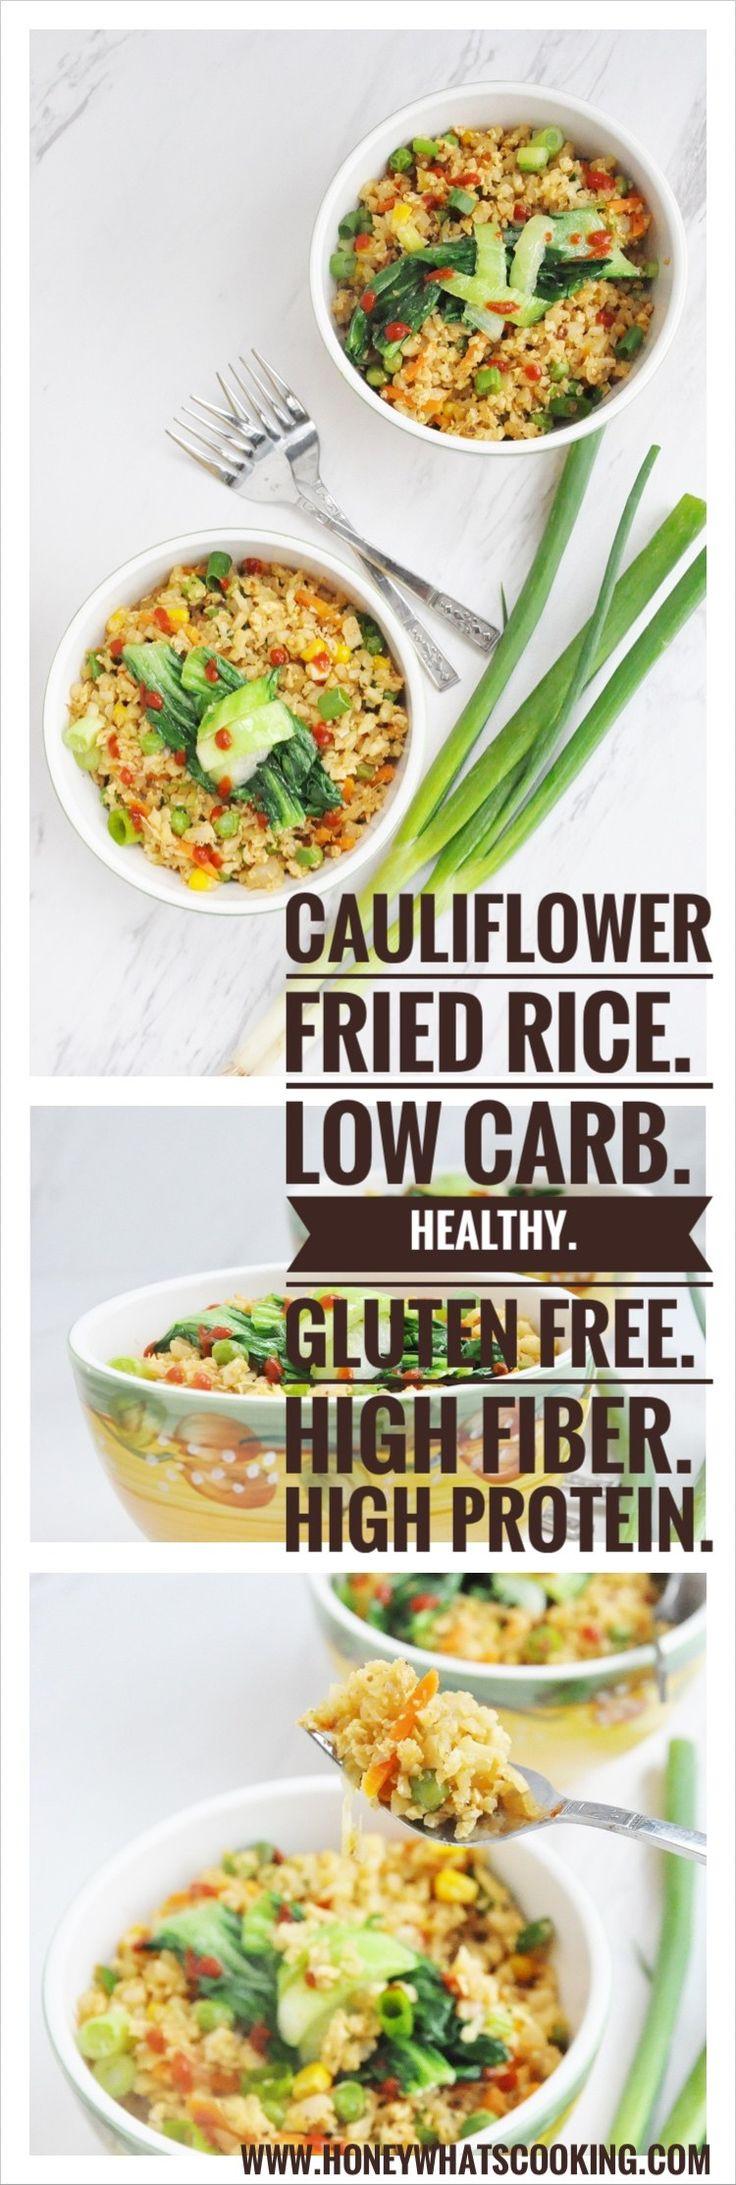 High Fiber Low Carb Recipes  Best 25 High fiber foods ideas on Pinterest